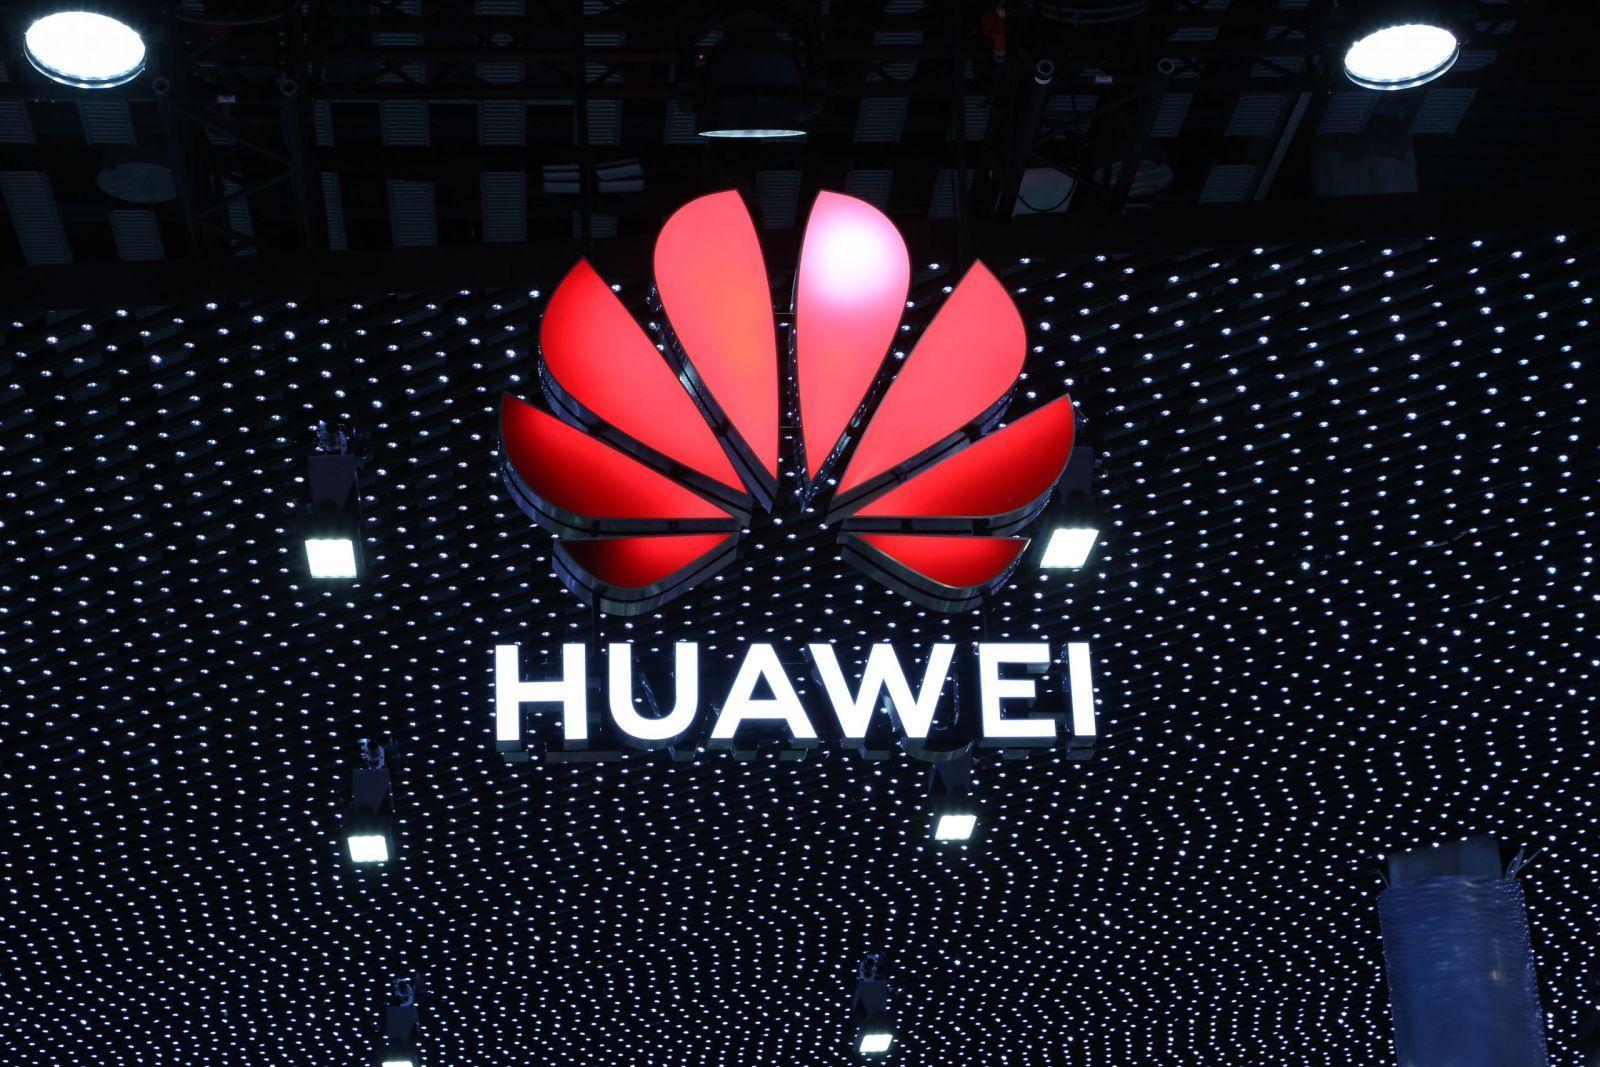 Huawei станет крупнейшим производителем смартфонов во втором квартале 2020 года (huawei logo mwc 2019 scaled)